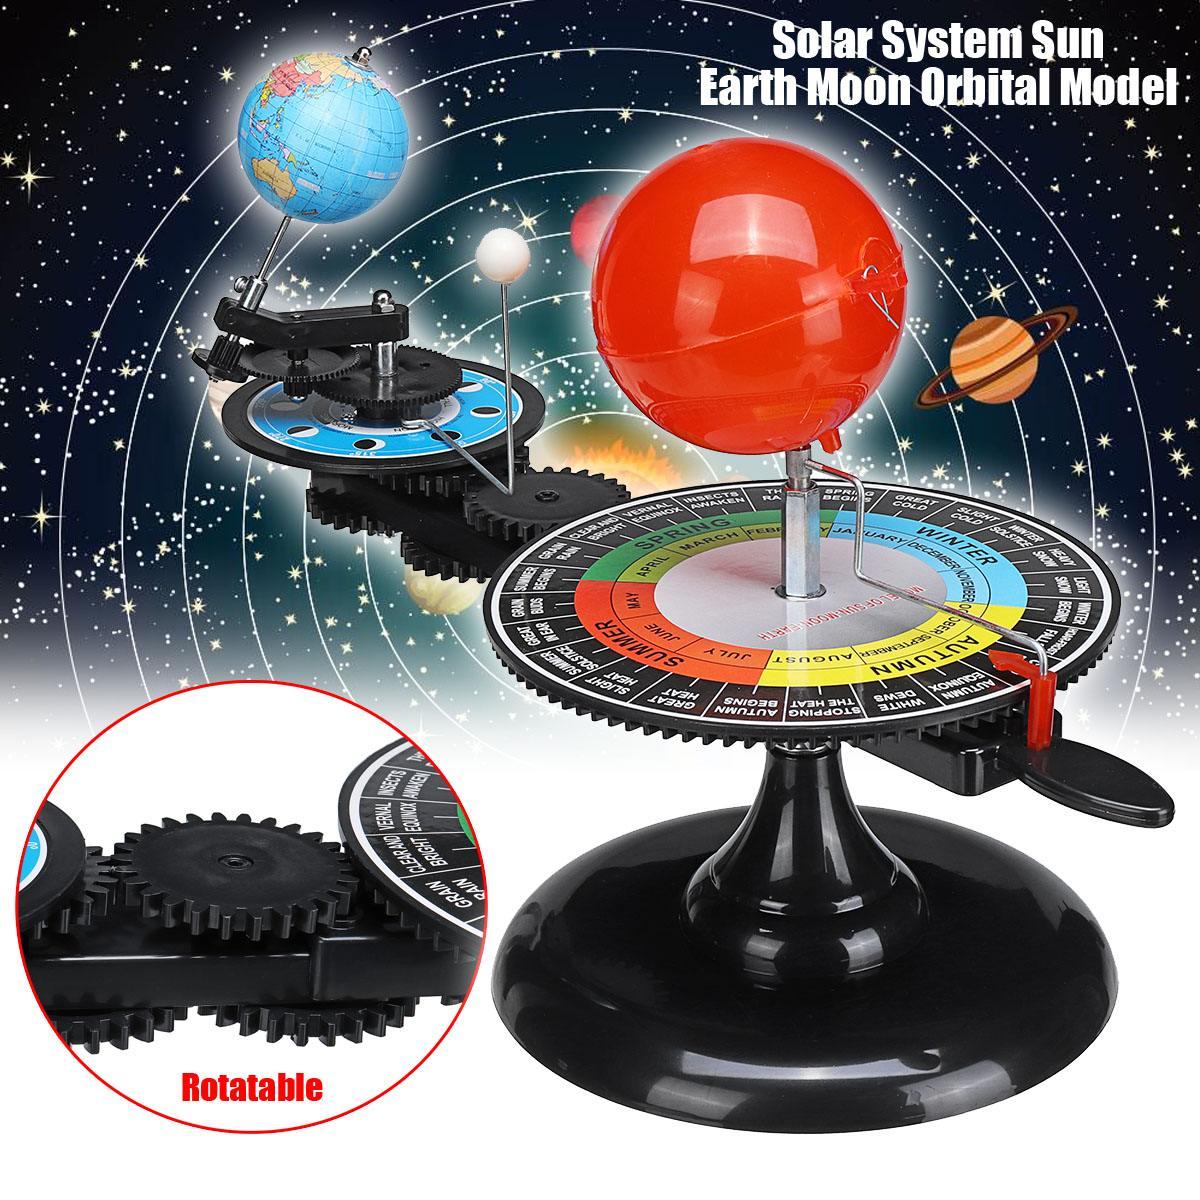 Solar System Globes Sun Earth Moon Orbital Planetarium Model Teaching Tool Education Astronomy Demo for Student Children Toy недорго, оригинальная цена